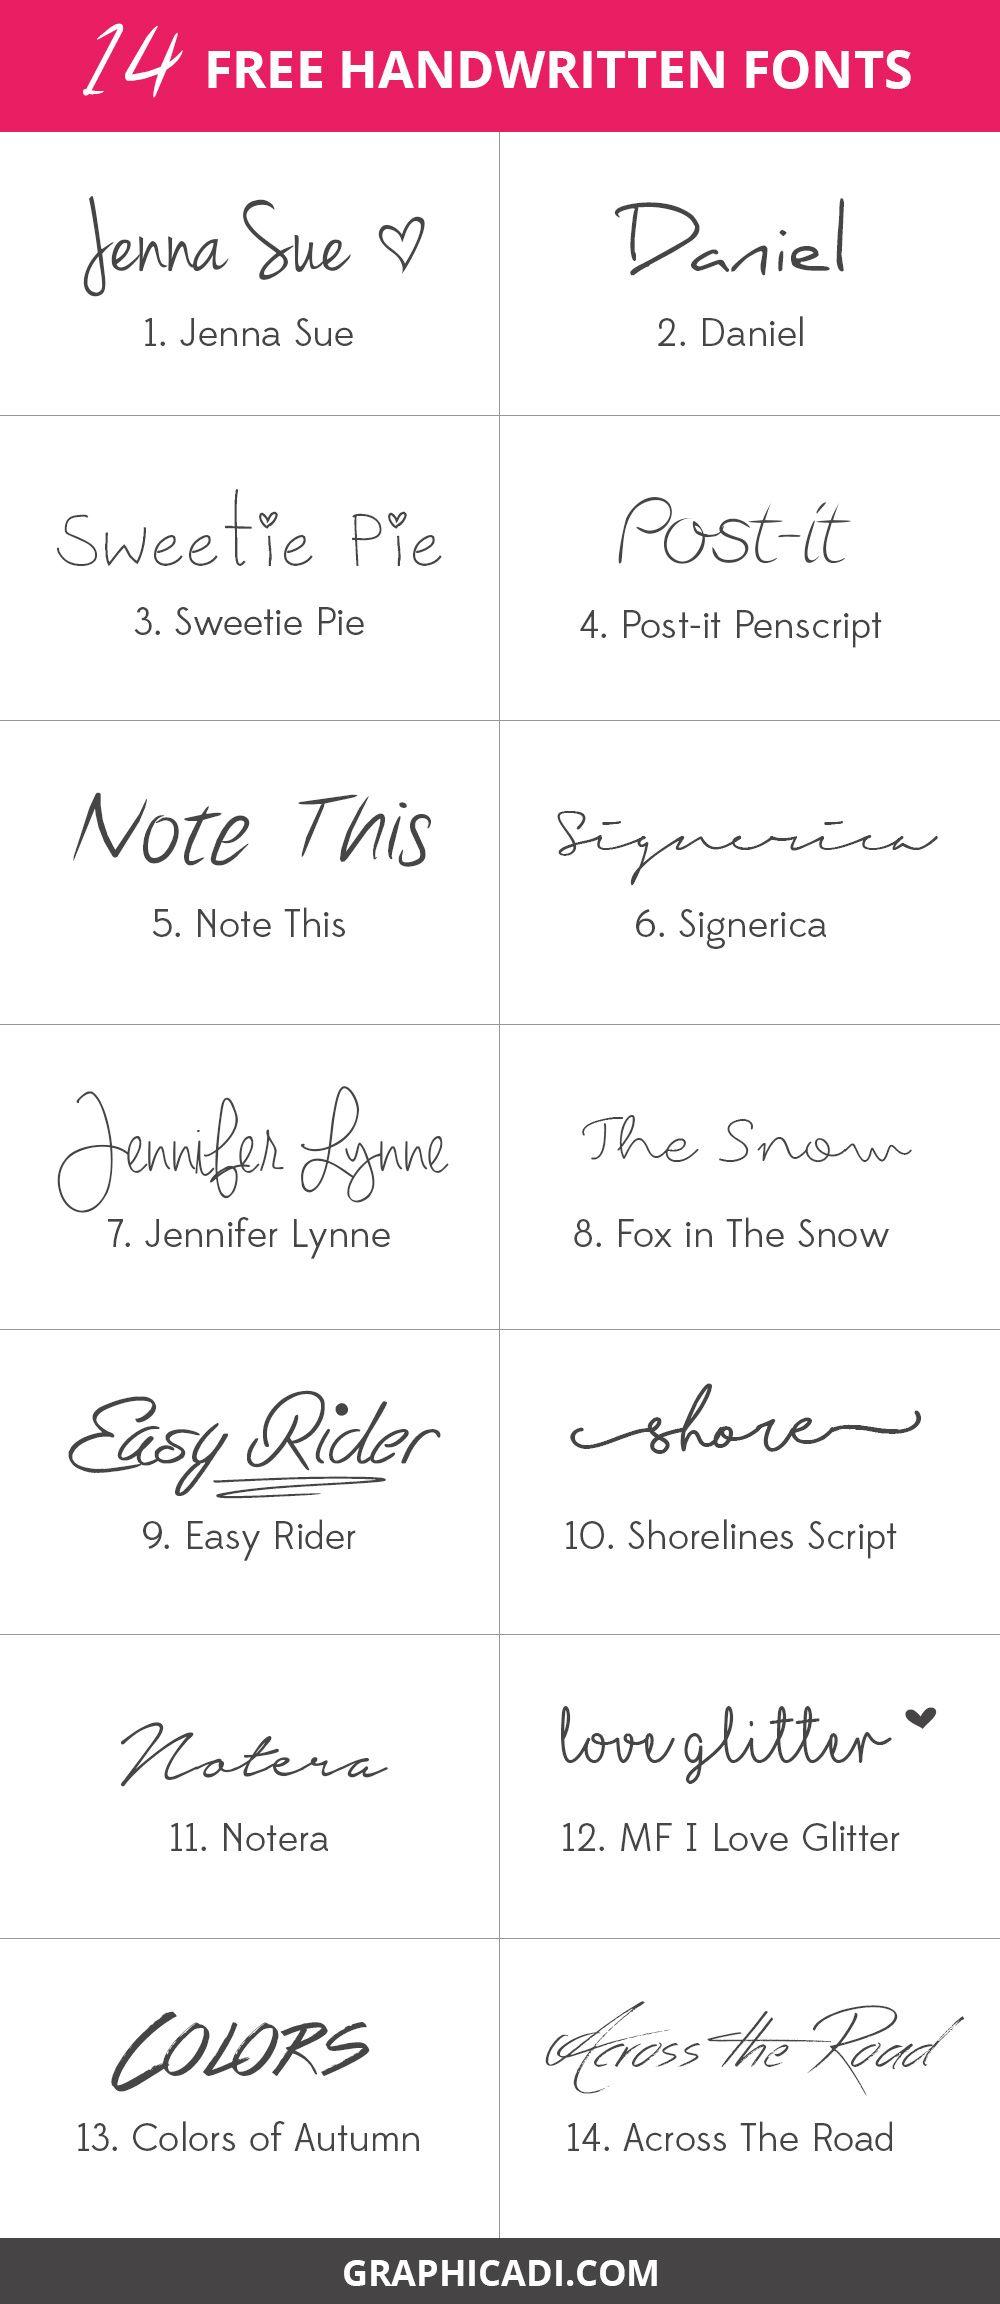 14 Free Handwritten Fonts | Free Handwritten Fonts